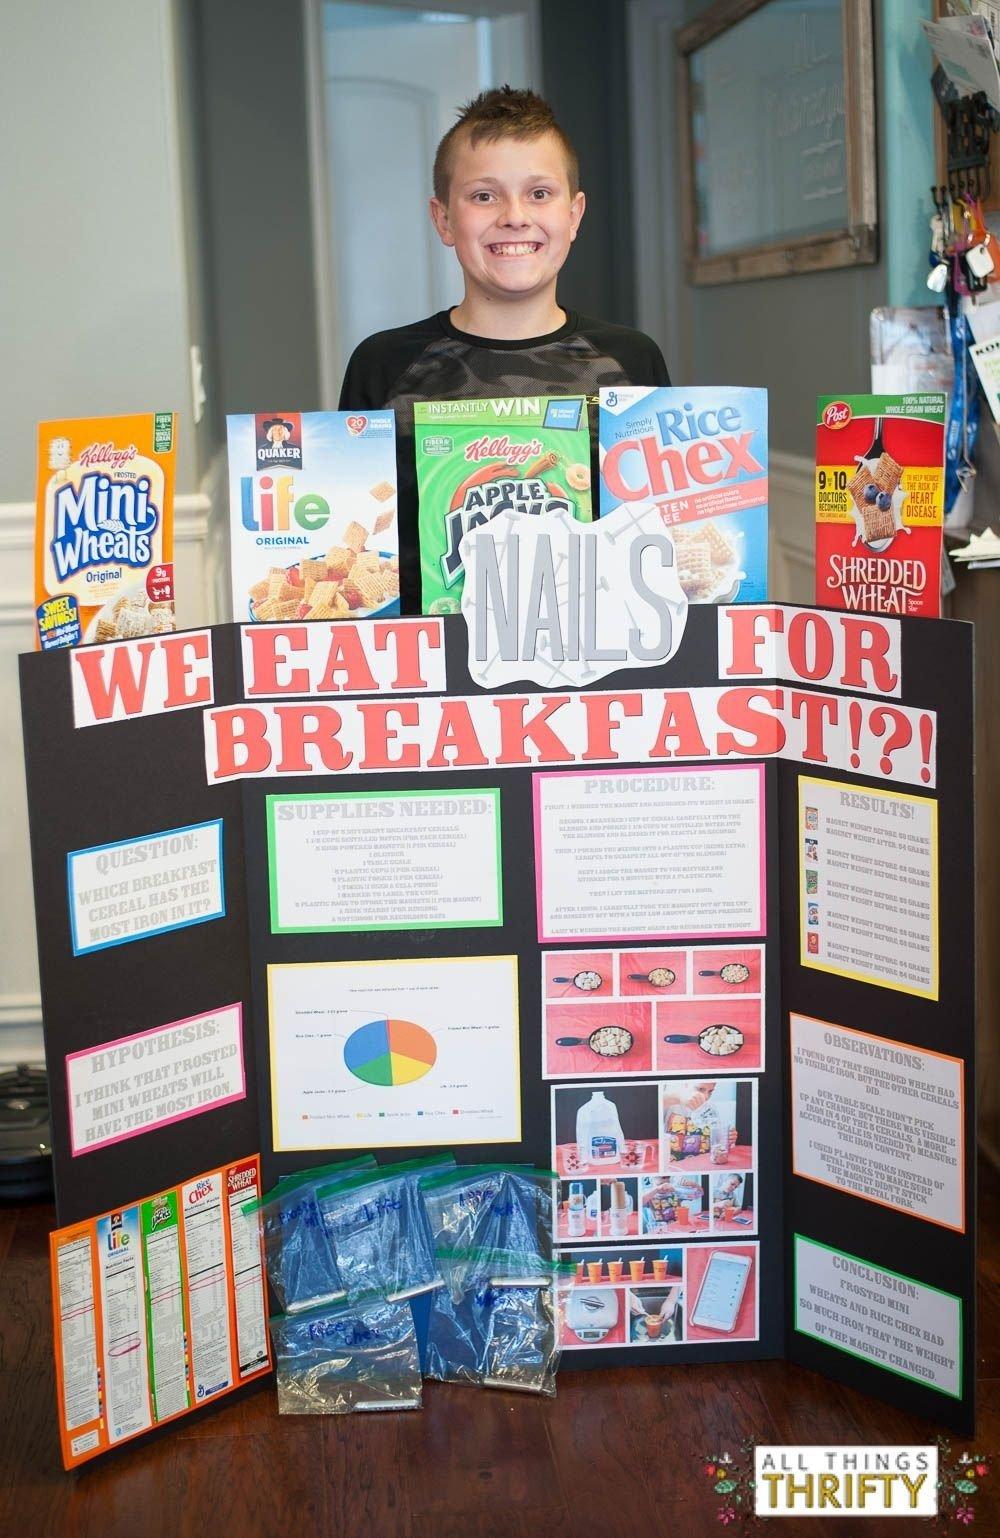 10 Pretty Elementary School Science Fair Project Ideas first place elementary school science fair project science fair 14 2020